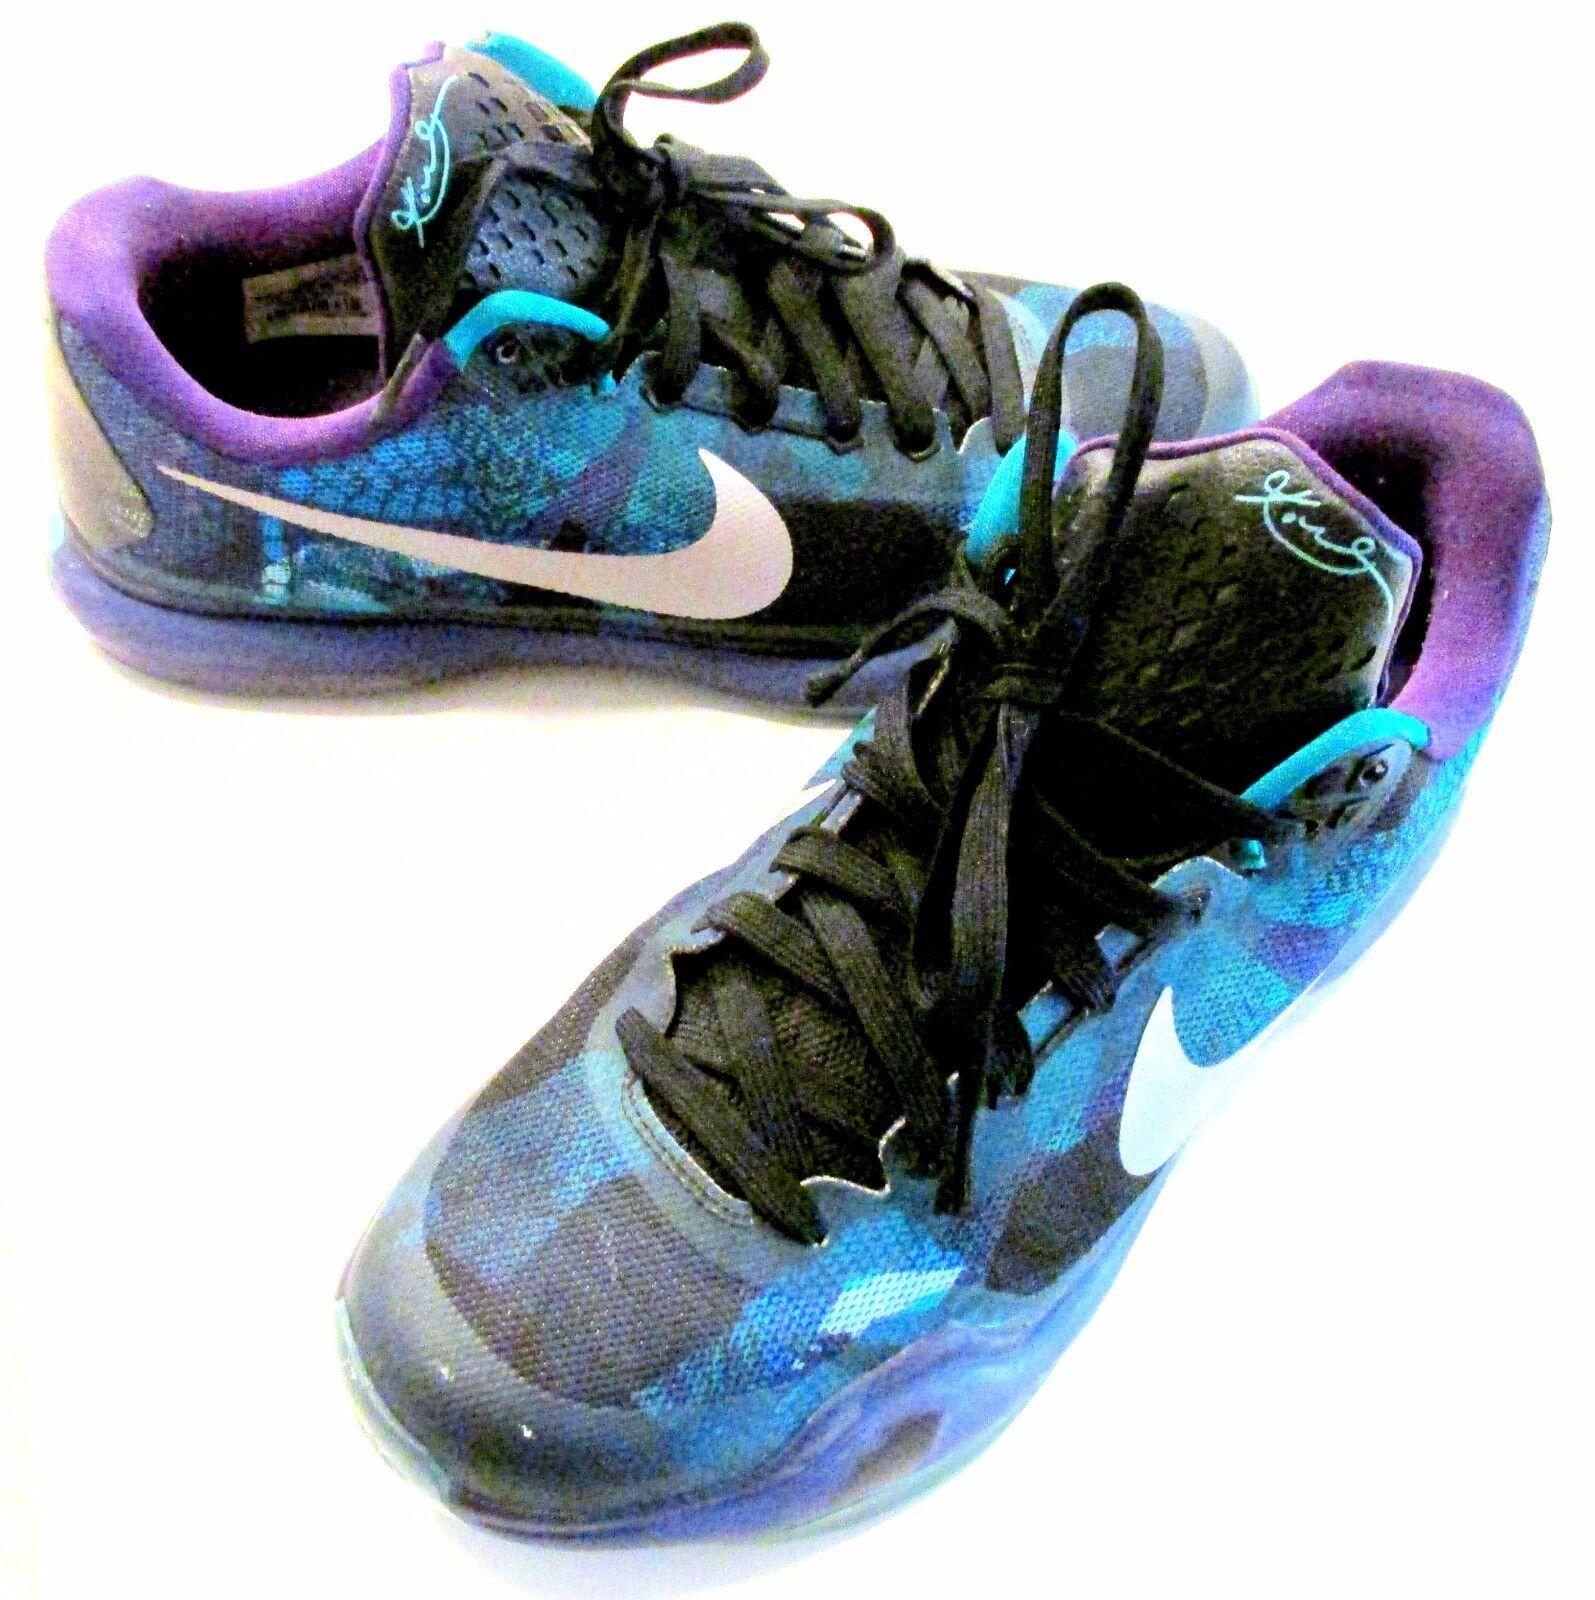 Nike Kobe X 705317-305 Emerald Glow/Court Purple Overcome Men's Size 10.5